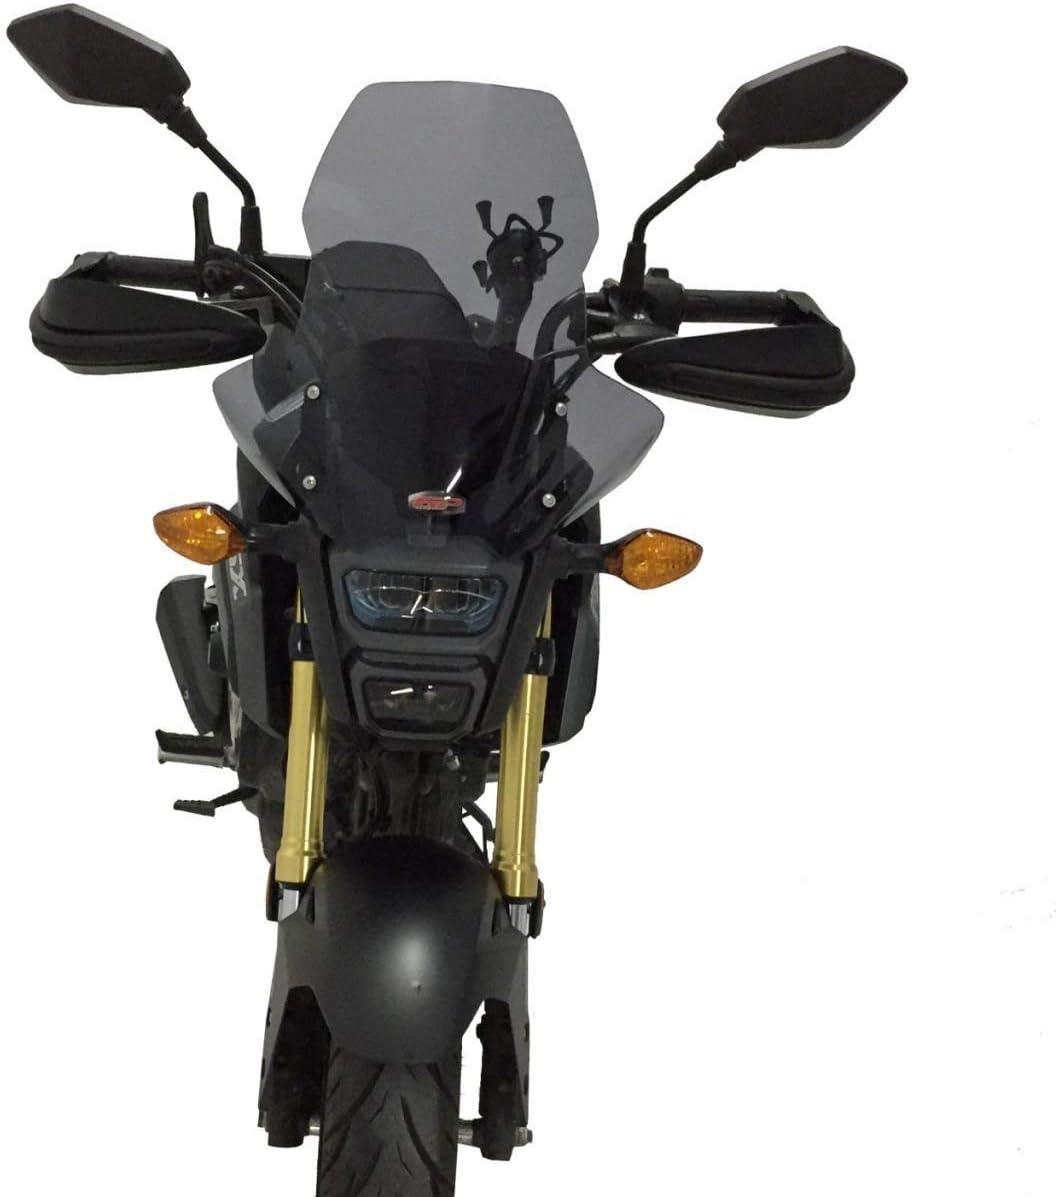 Honda MSX 125 Grom touring windscreen windshield 44cm 2012-19